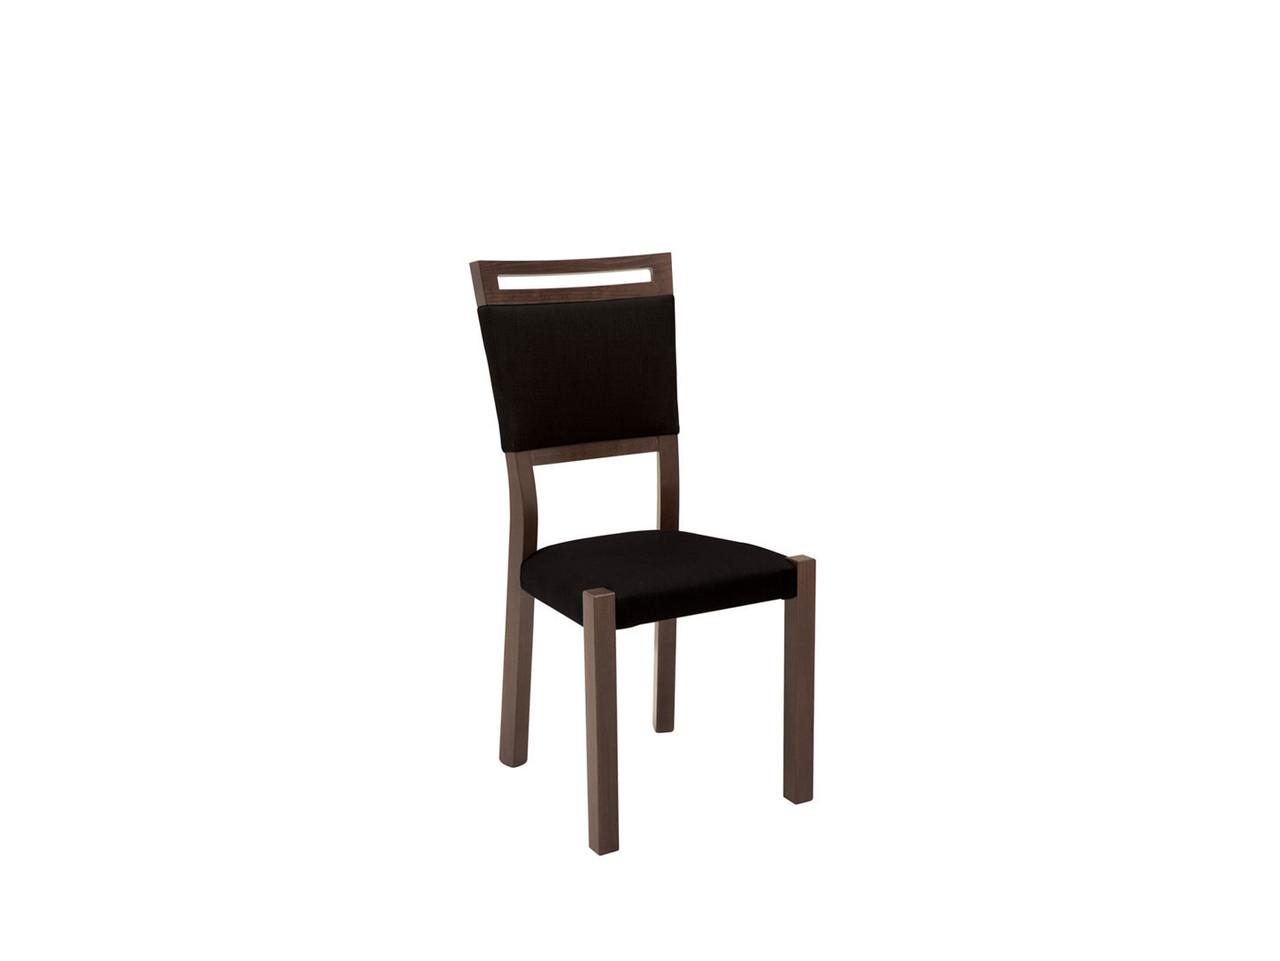 Кресло Alhambra   D09-TXK_ALHAMBRA-TX053-1-TK2052 (BRW)